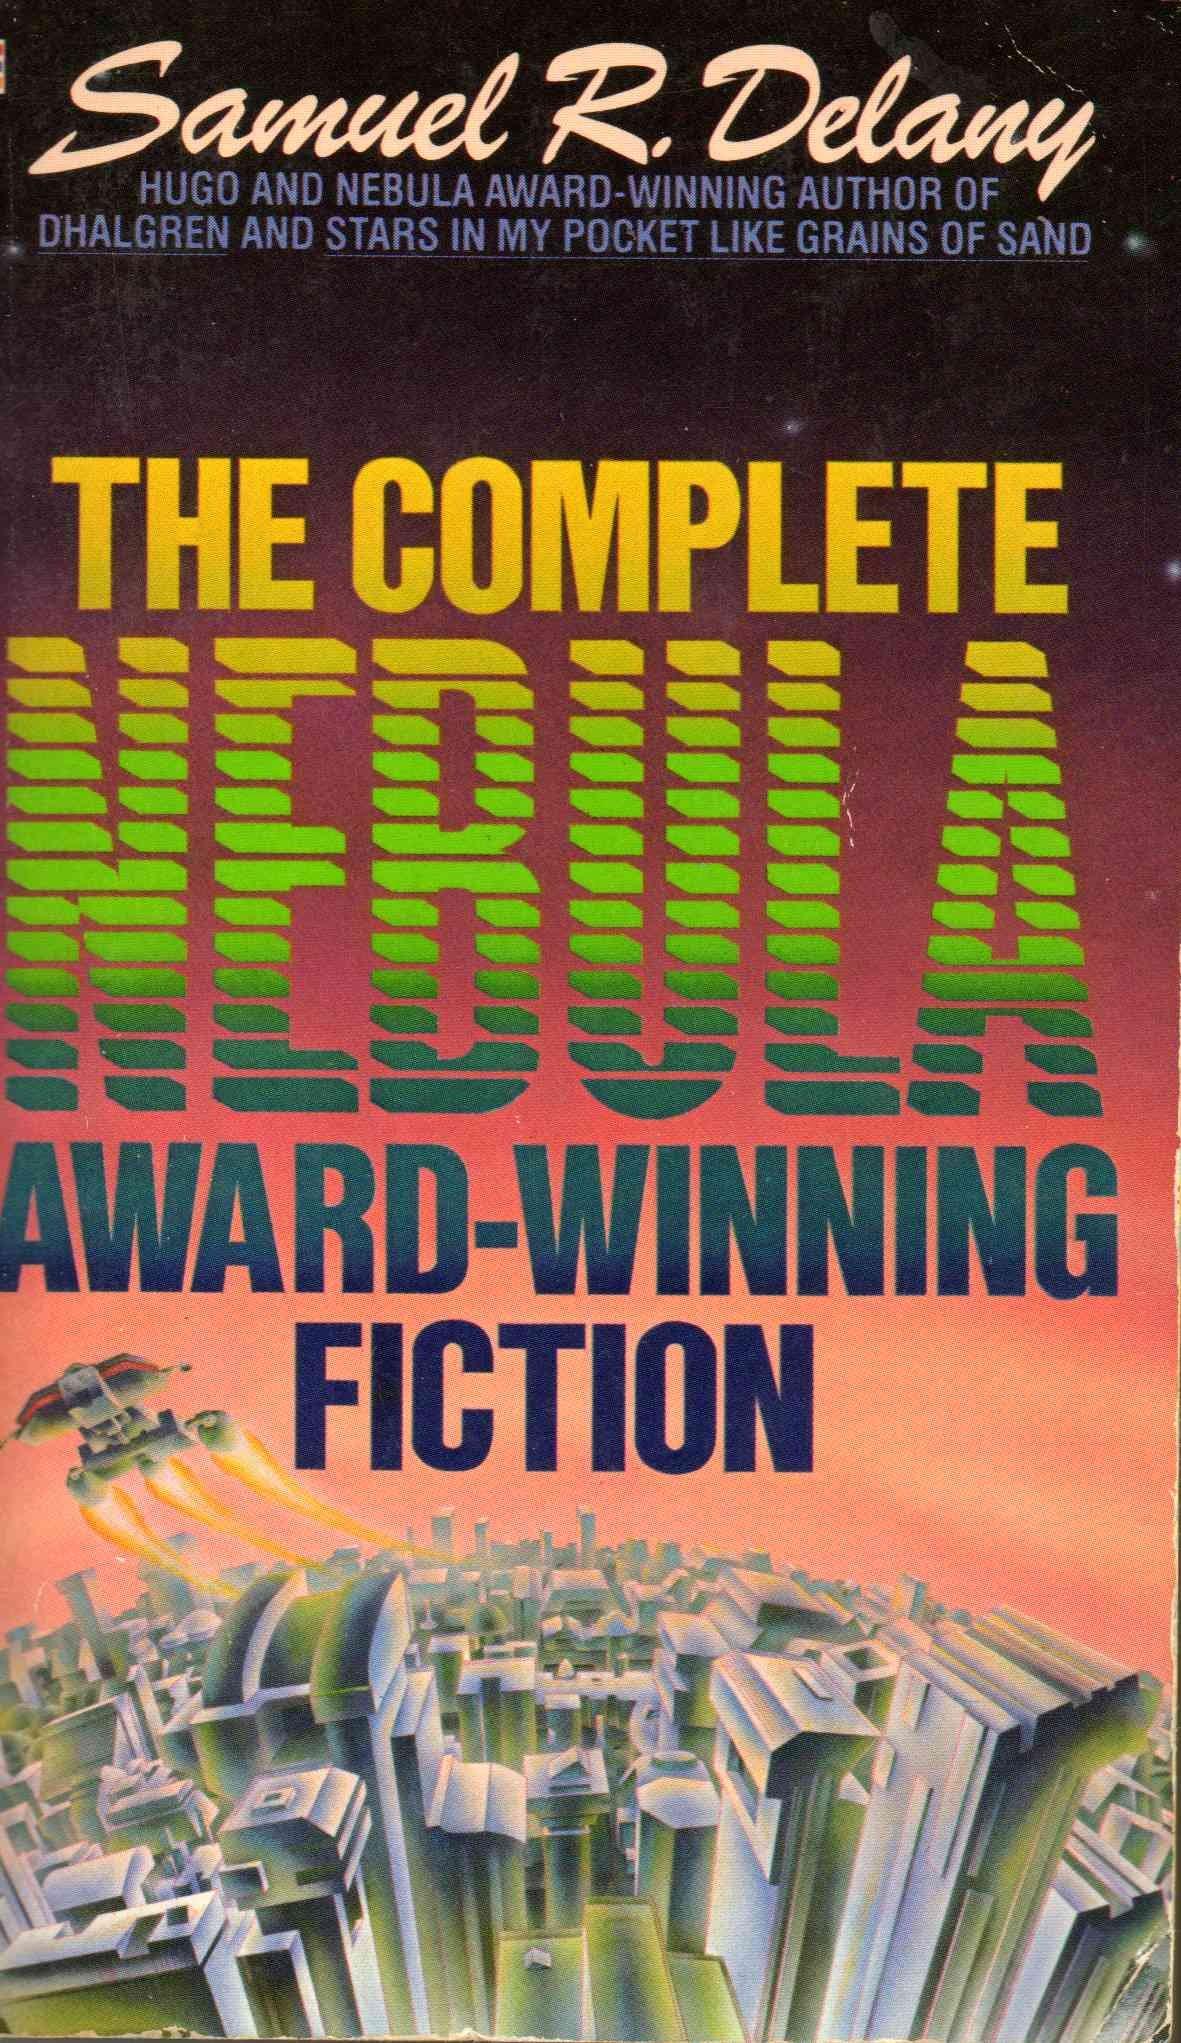 The Complete Nebula Award-Winning Fiction of Samuel R